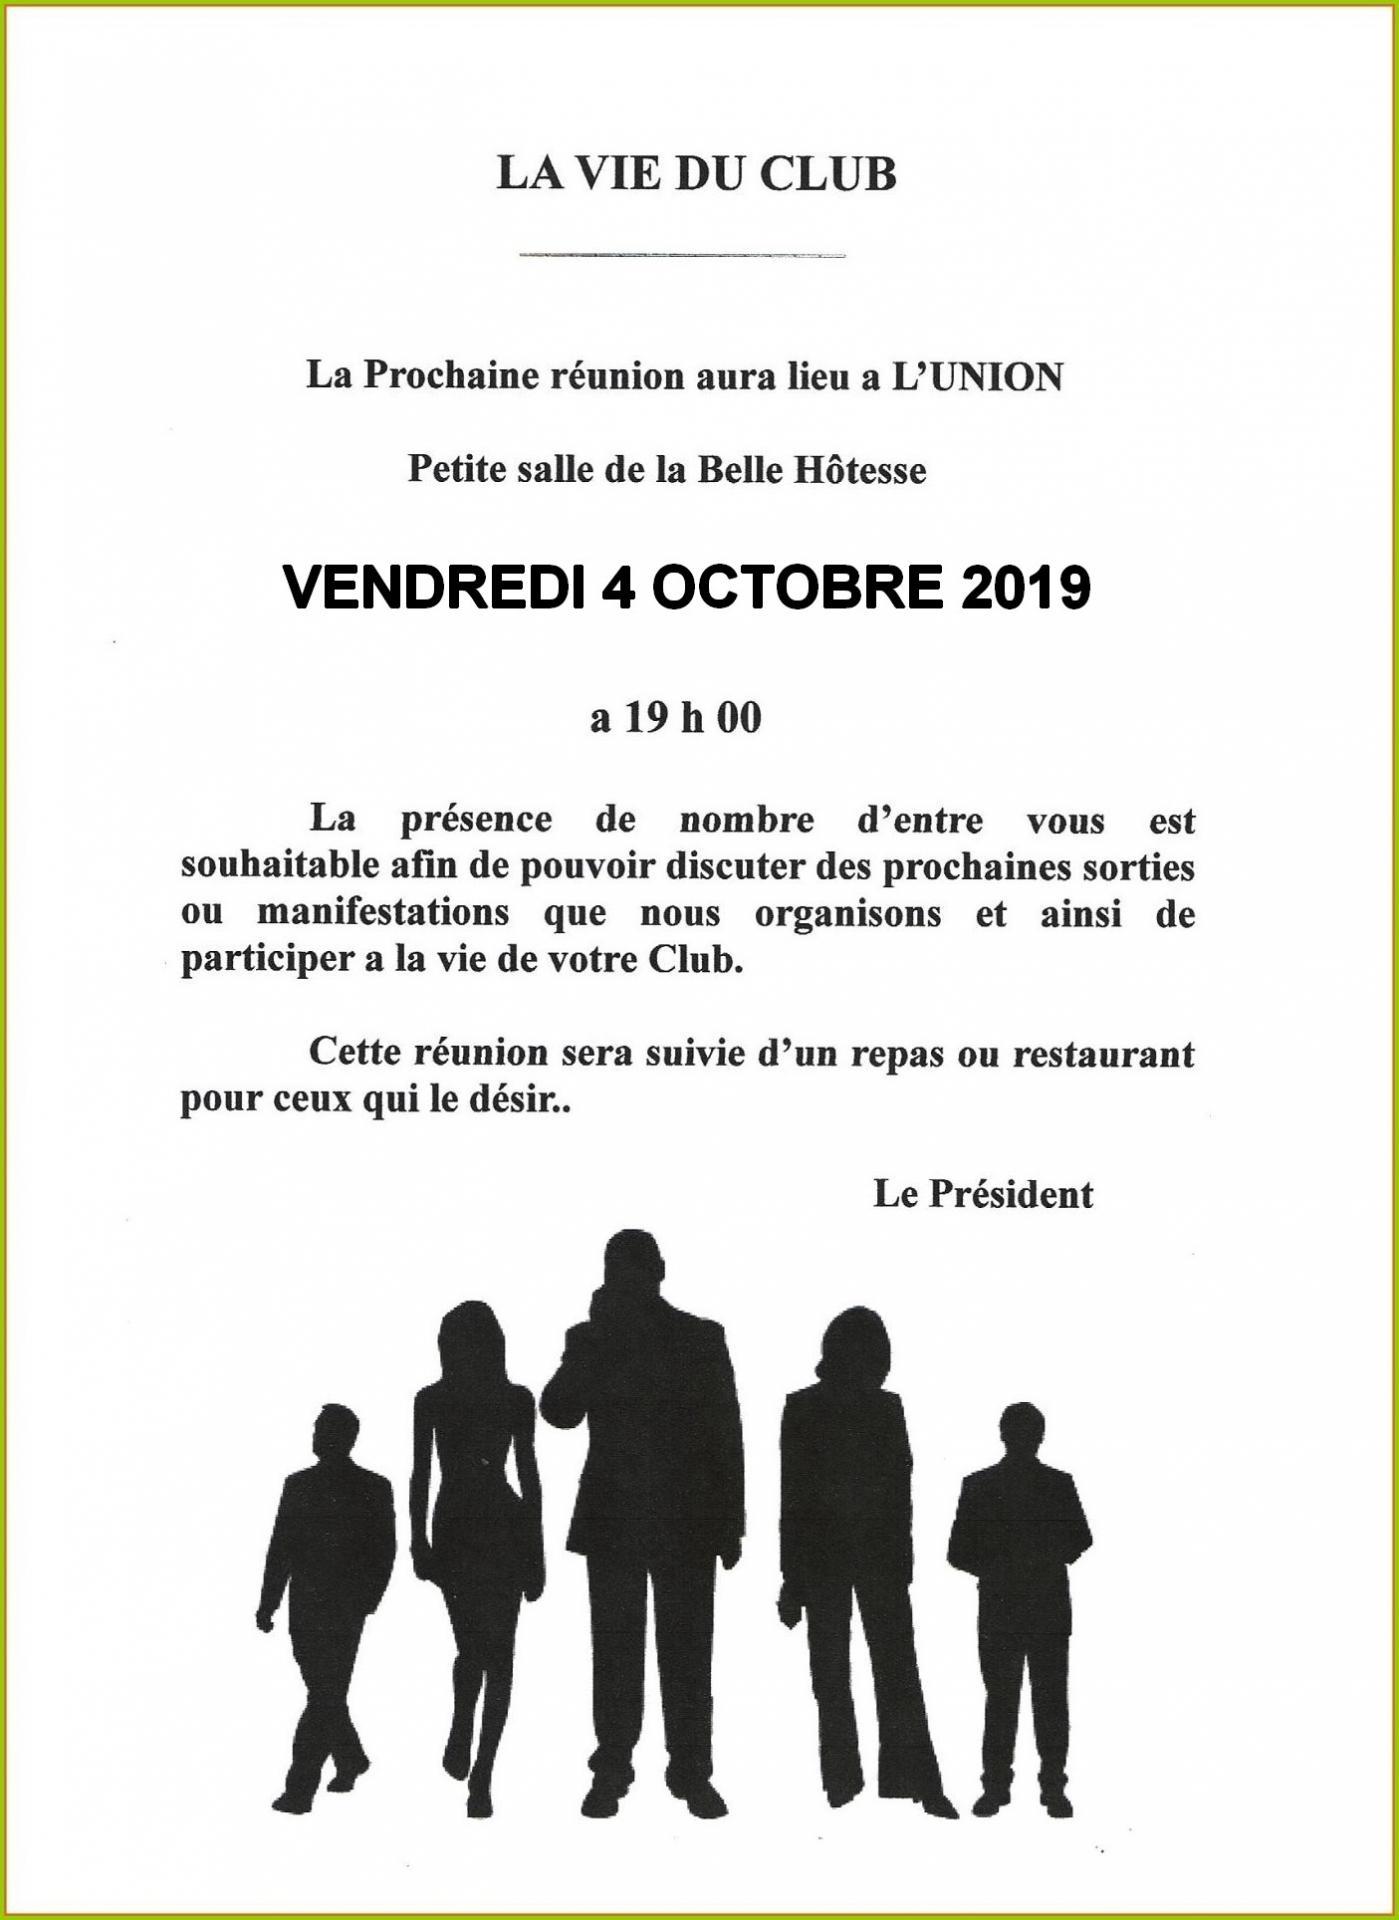 Reunion belle hotesse 10 2019